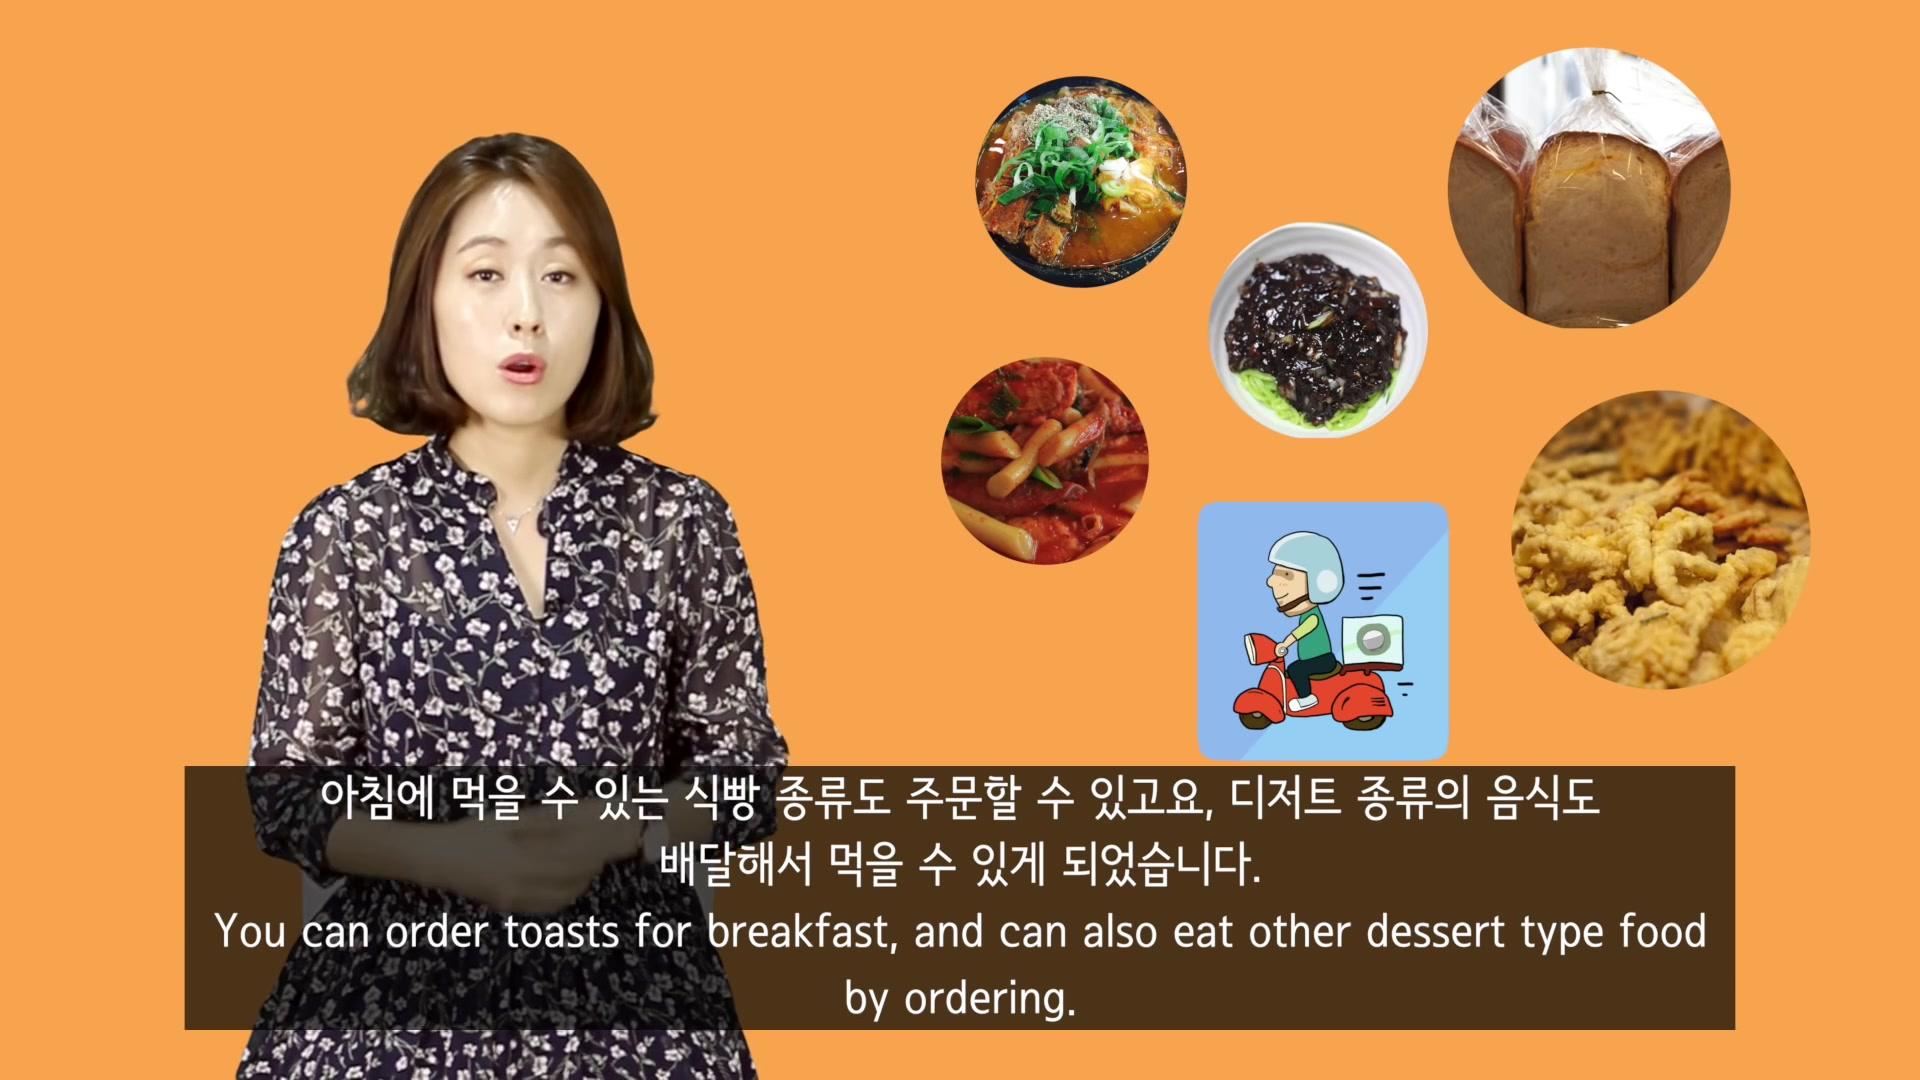 TalkToMeInKorean Episode 92: Listening Practice in Slow Korean: Food Delivery